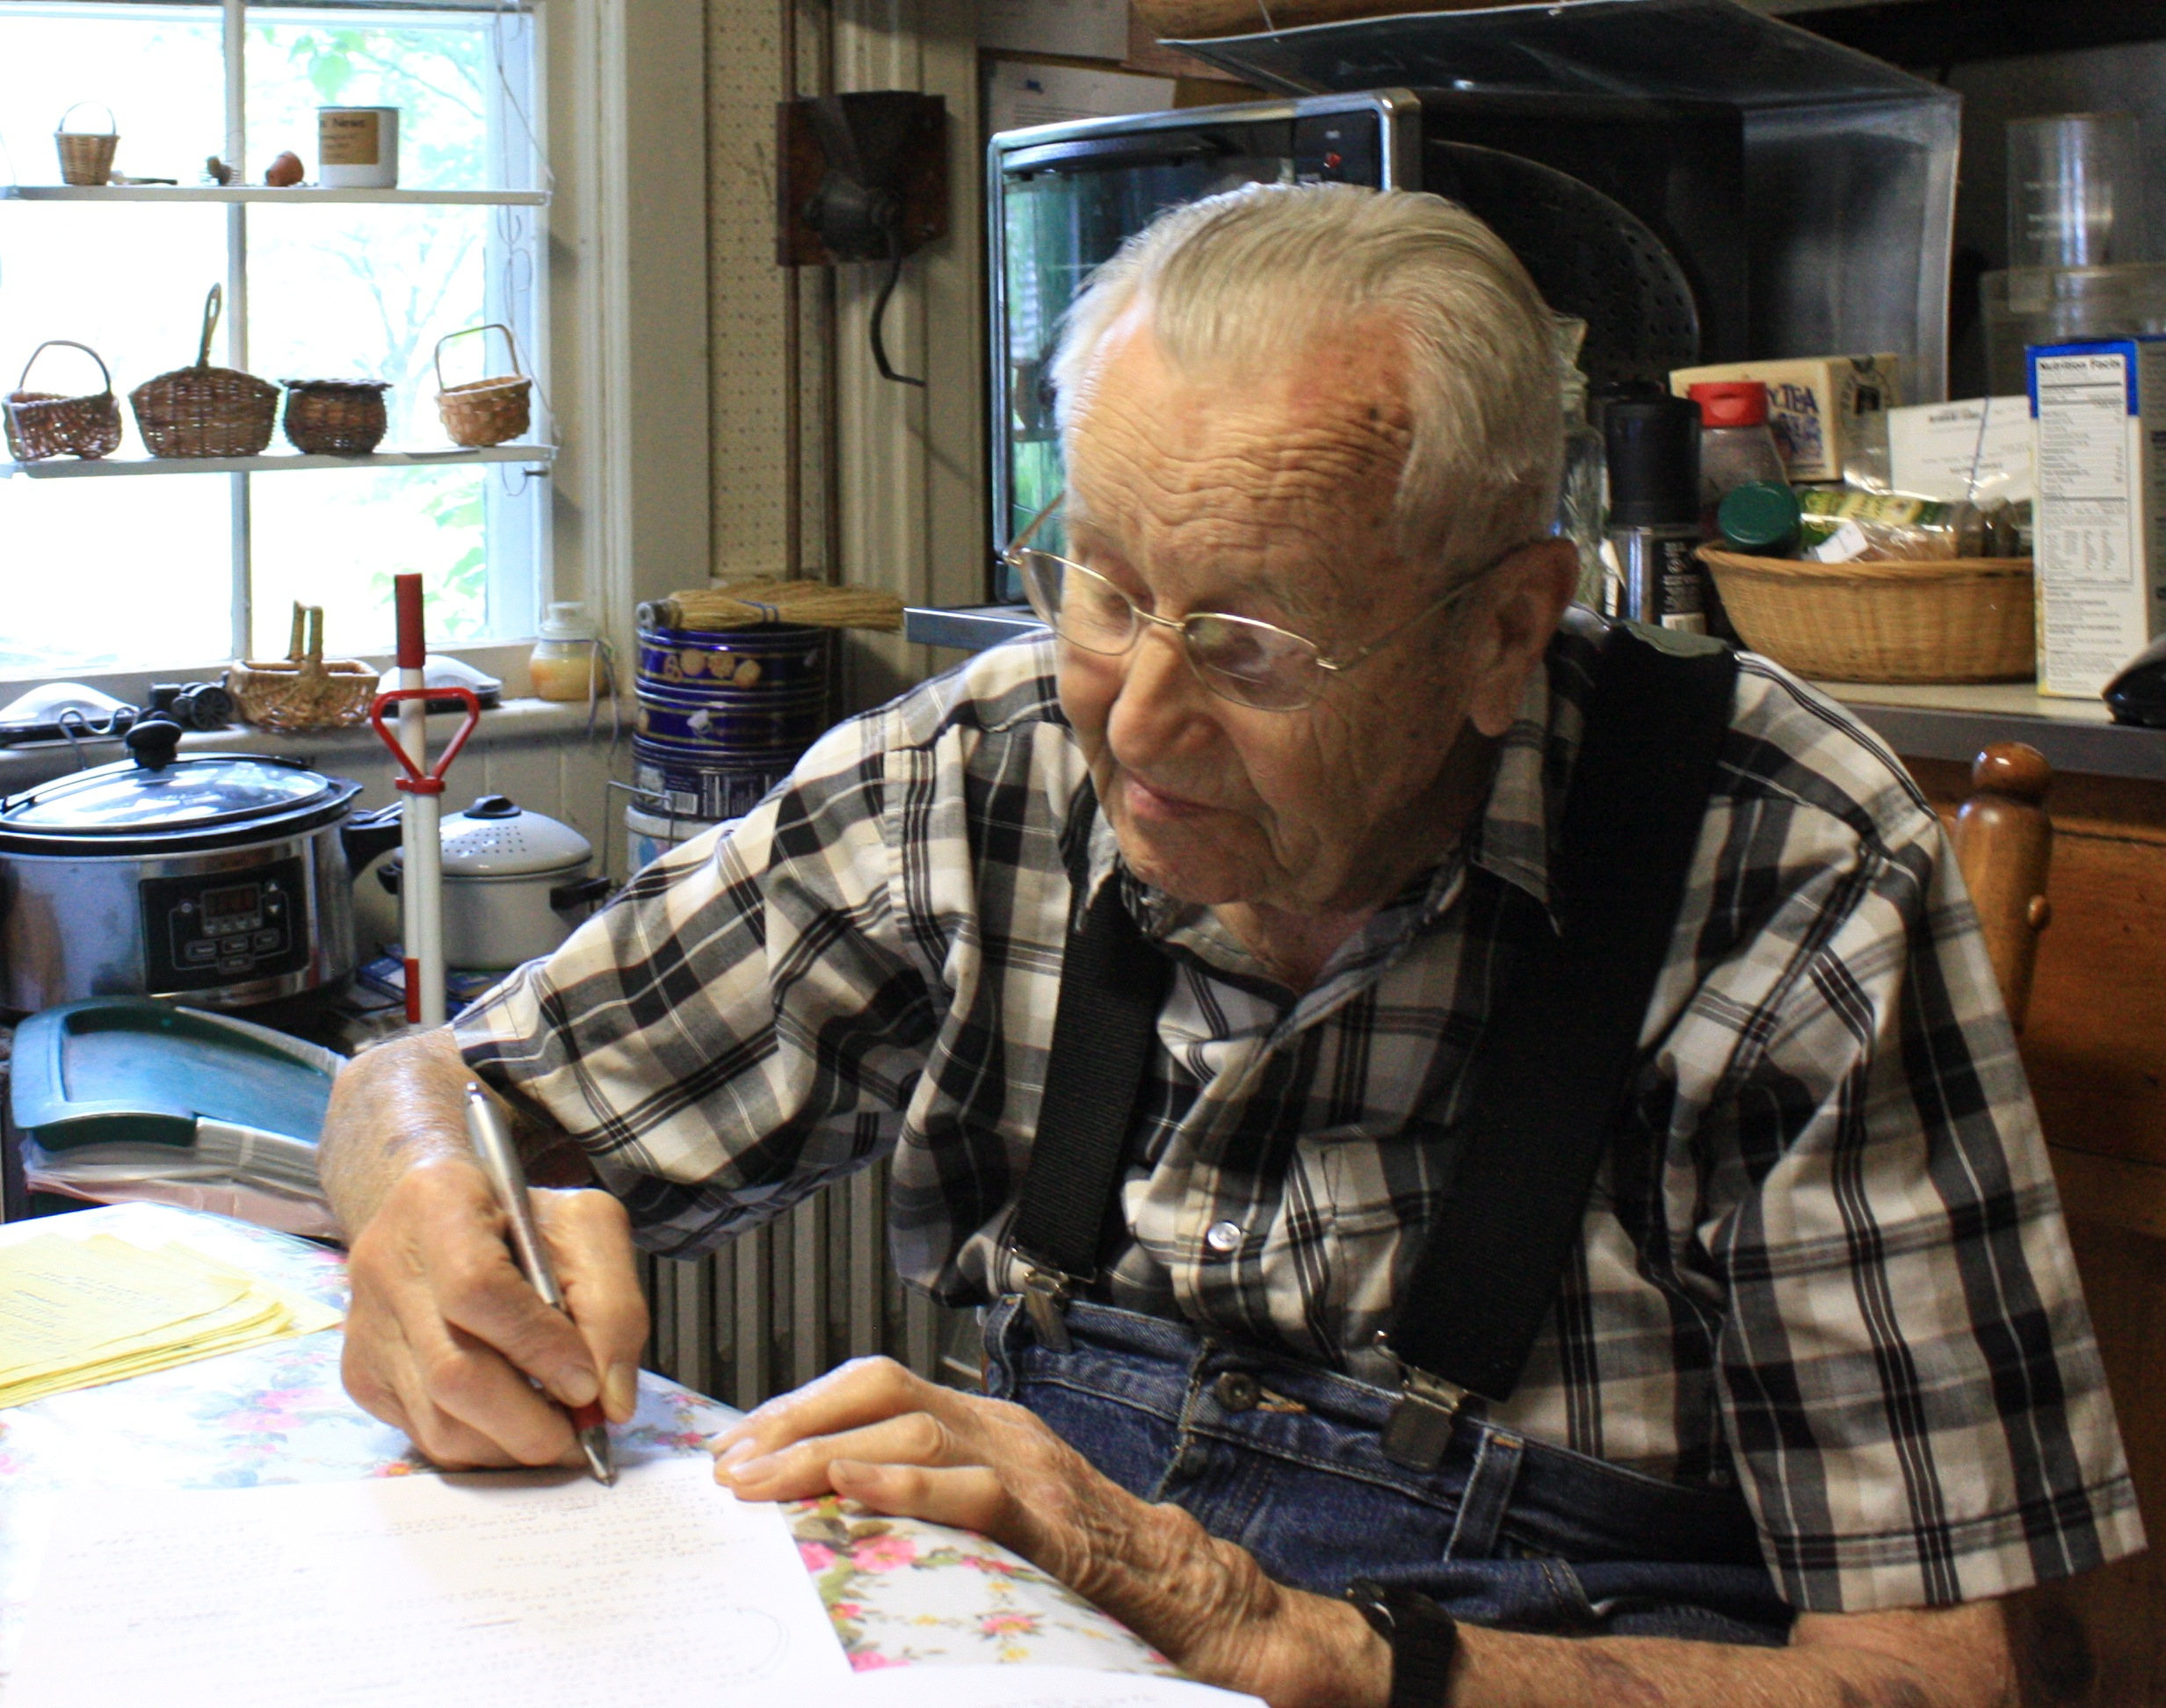 Everett Rau in his kitchen. June 2014.